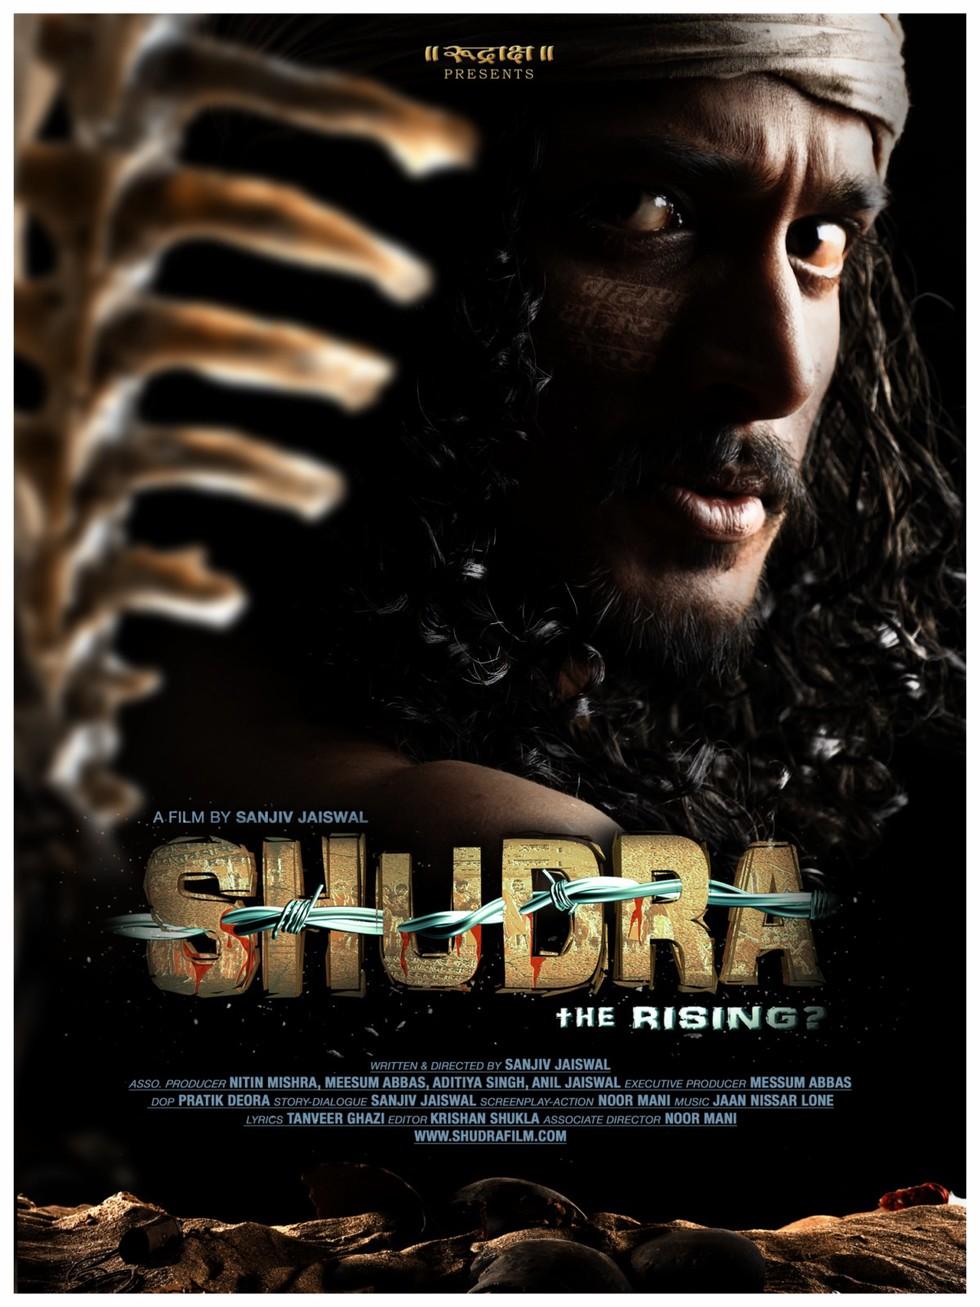 Shudra The Rising - Movie Poster #2 (Large)